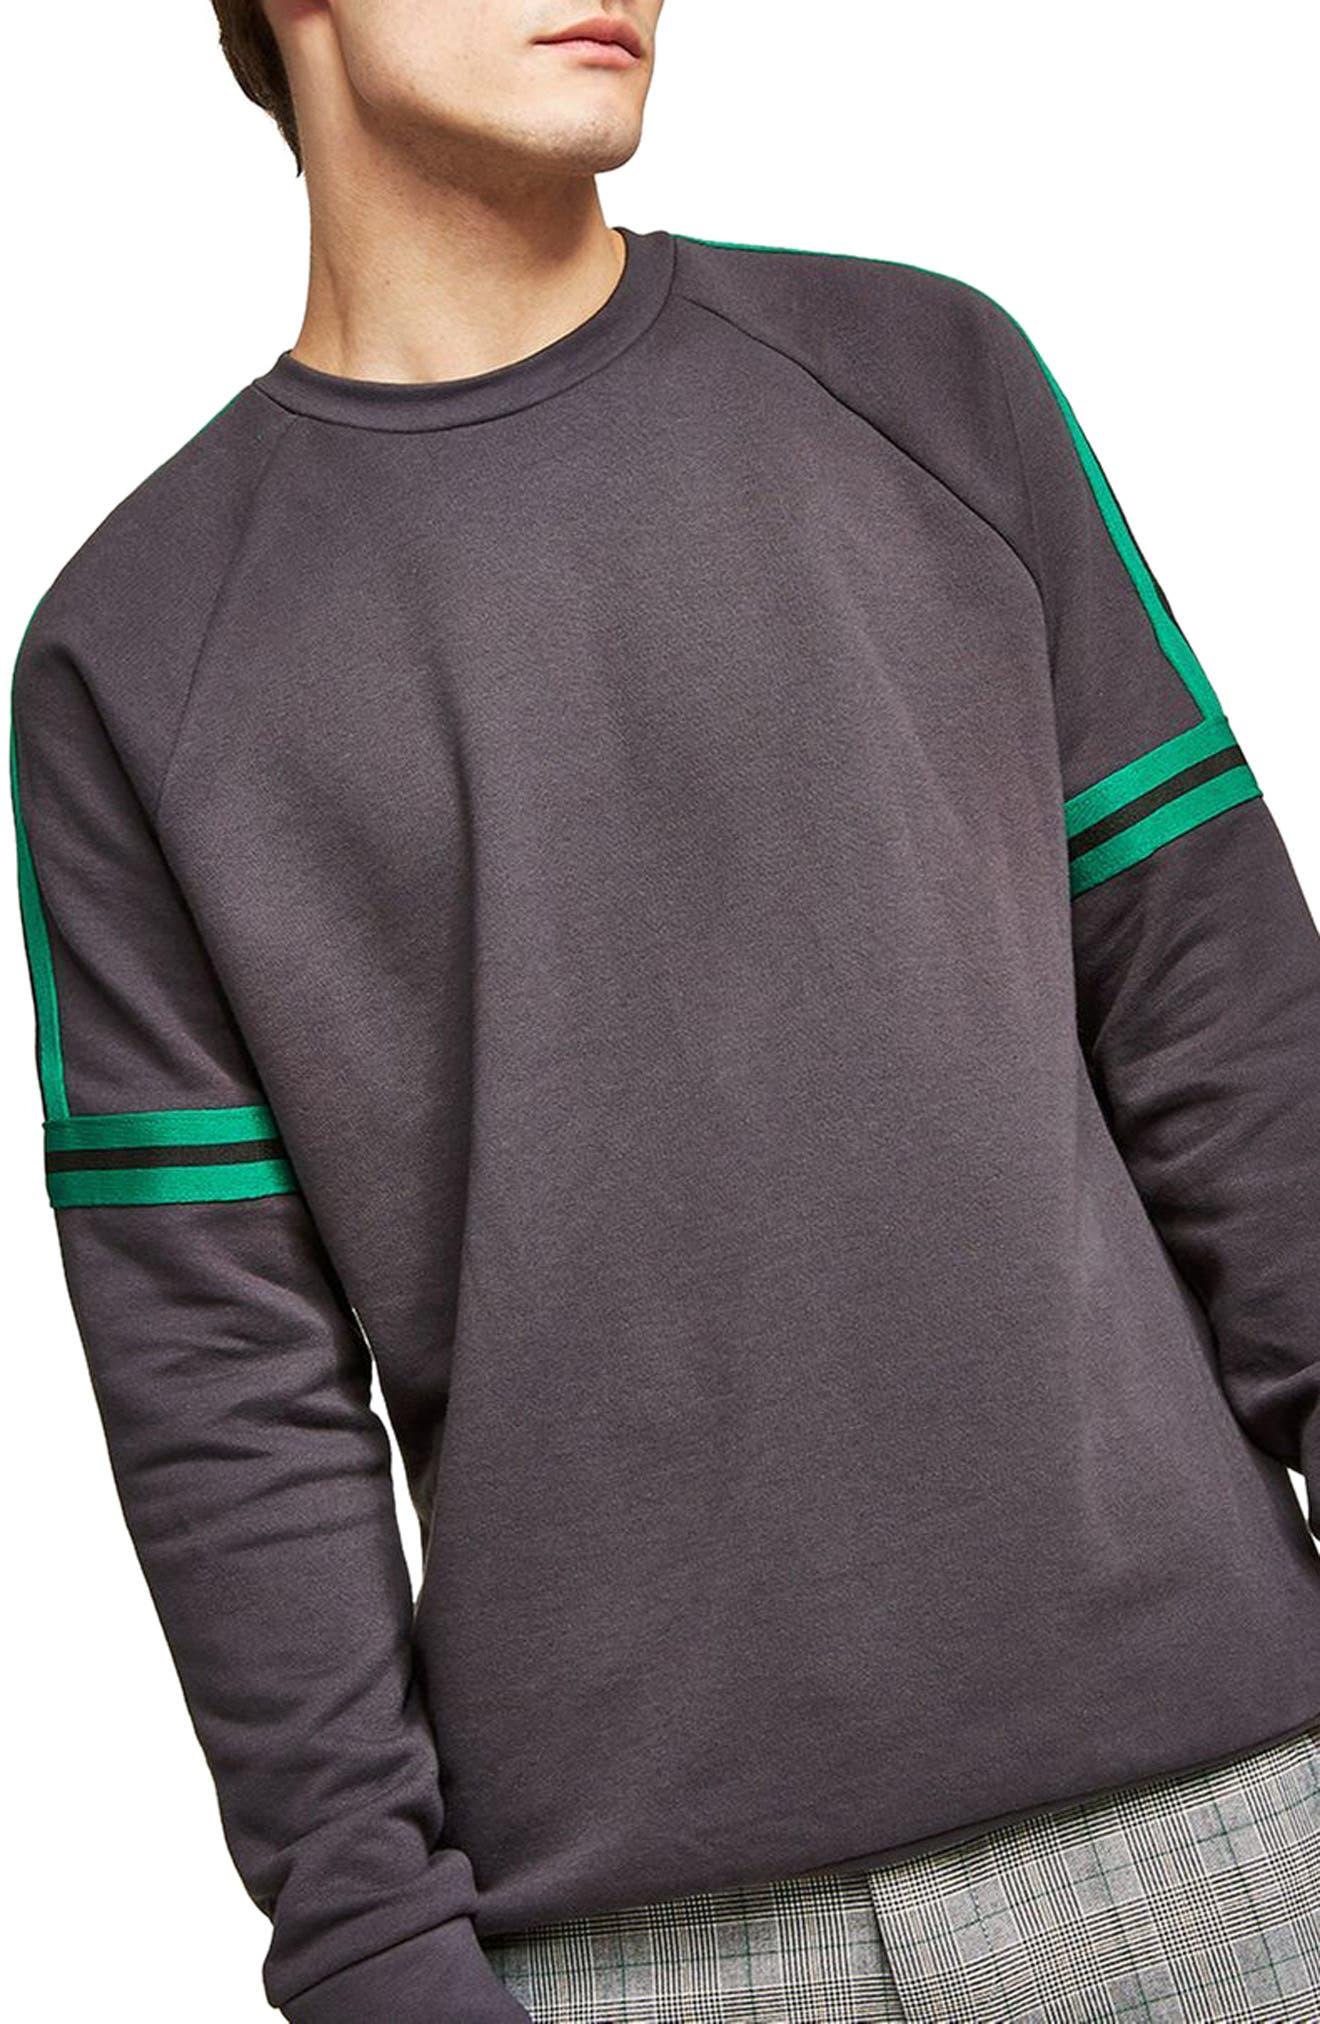 Tape Crewneck Sweatshirt,                         Main,                         color, Grey Multi